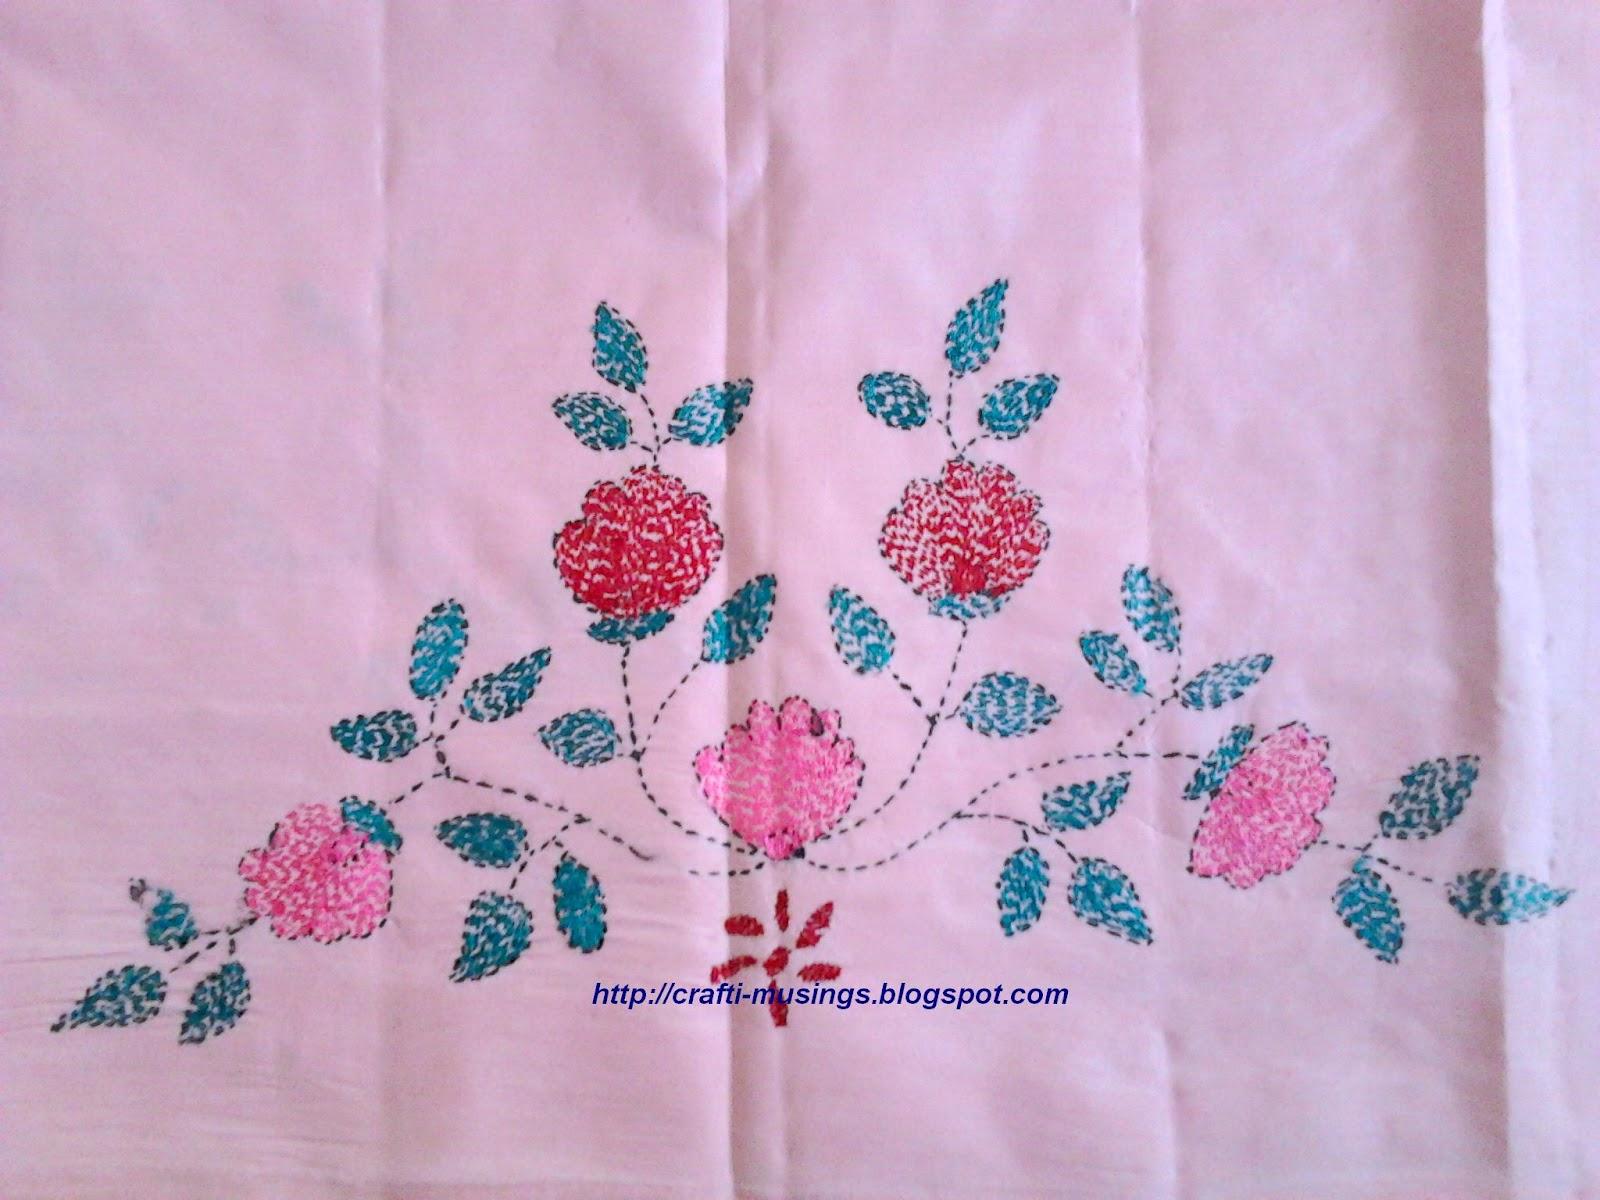 Crafti Musings Saree Embroidery 9 Kantha Bengali Embroidery 3